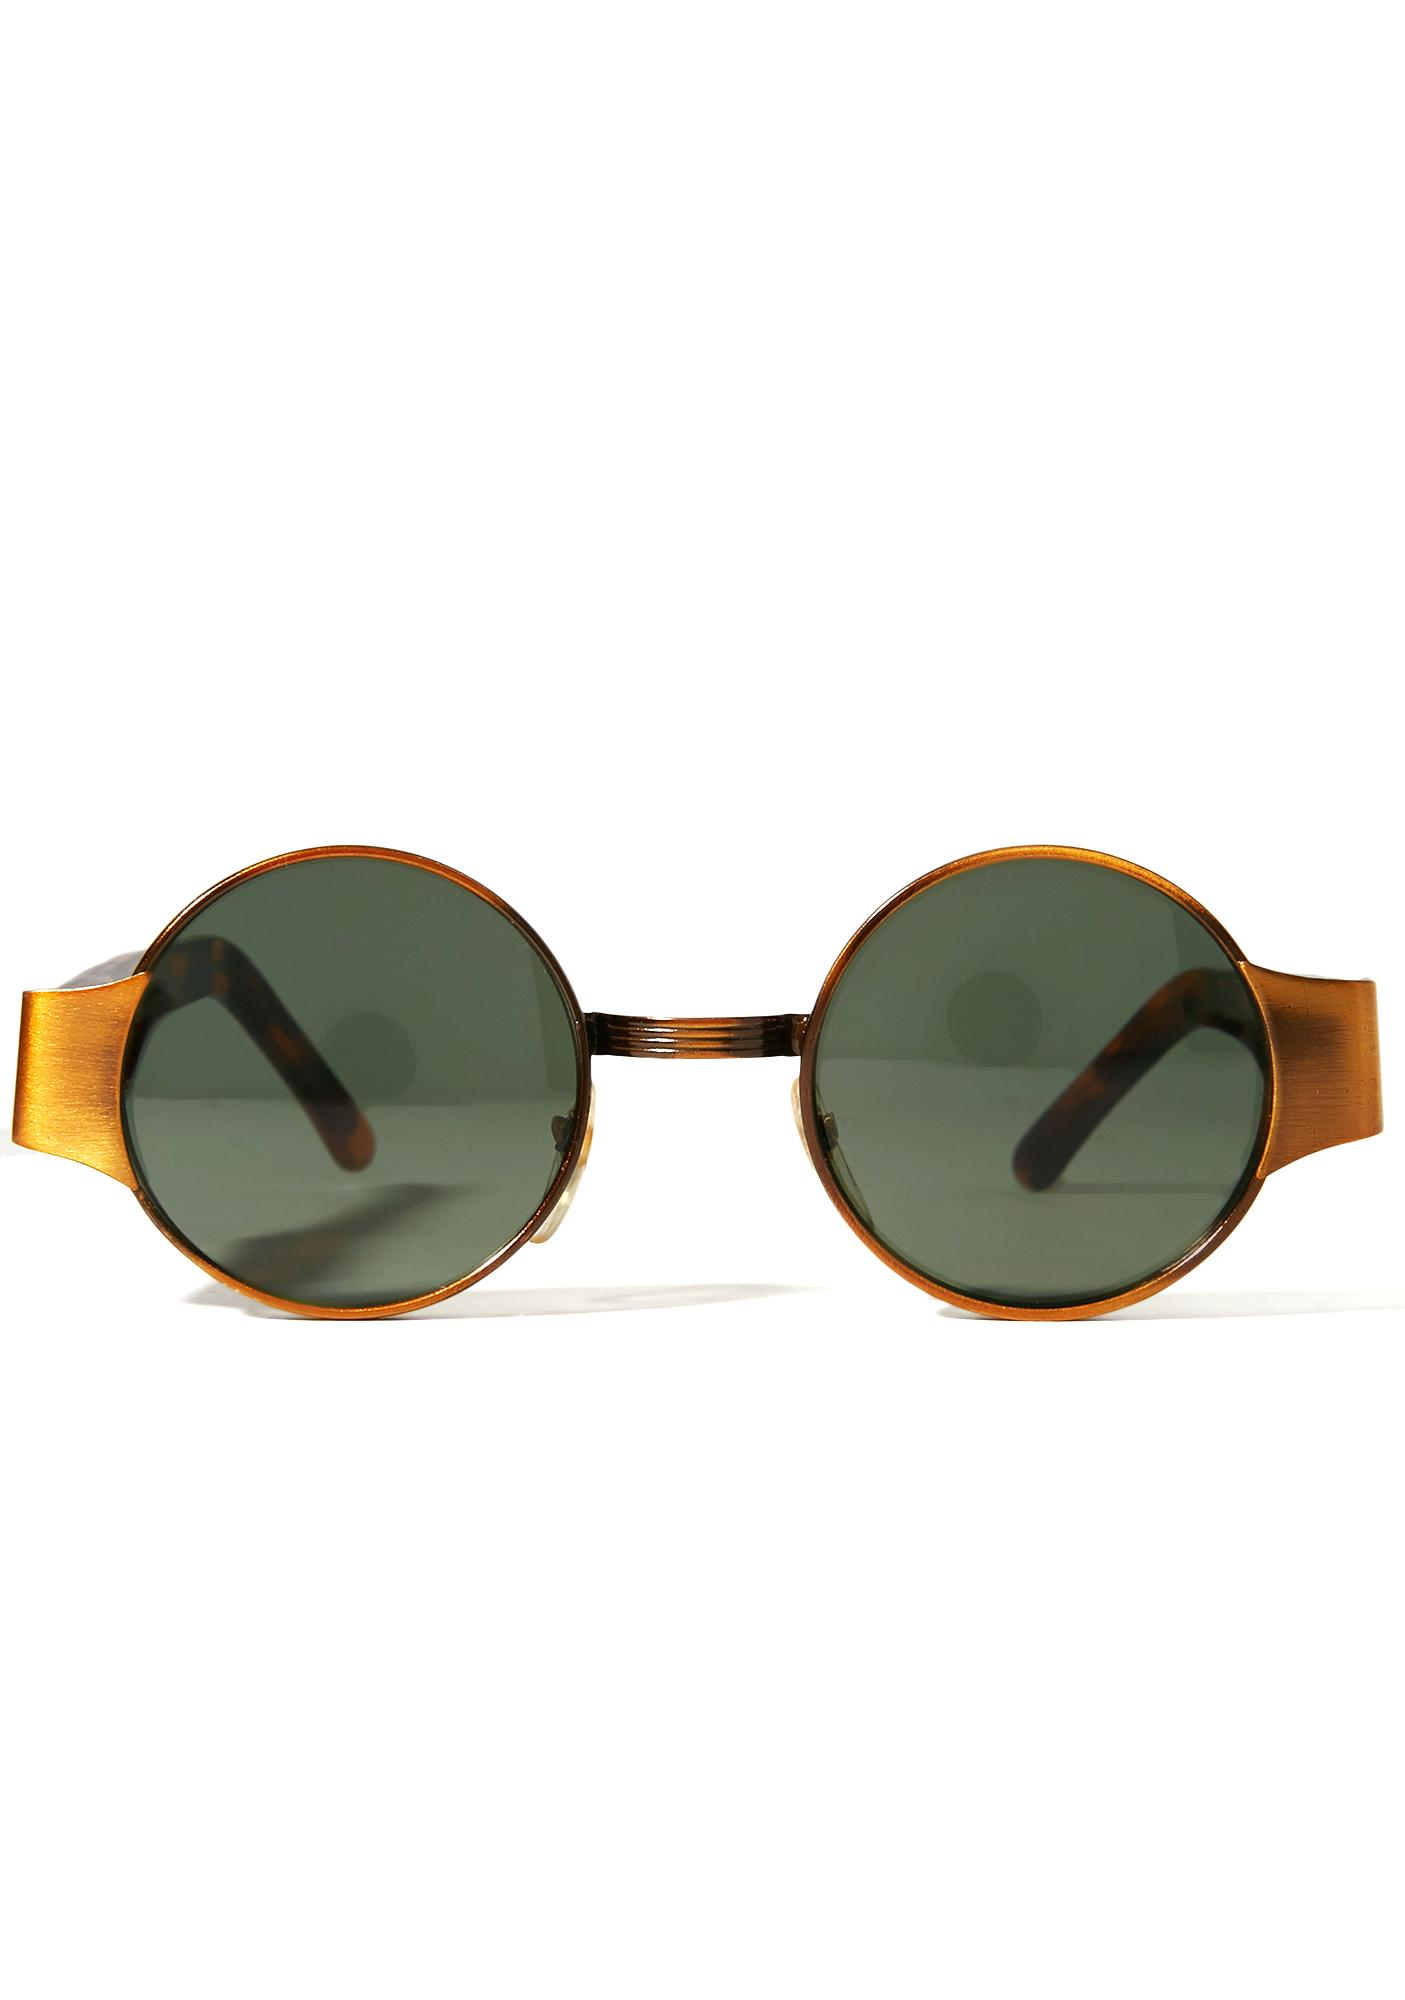 Hell Yeah Sunglasses